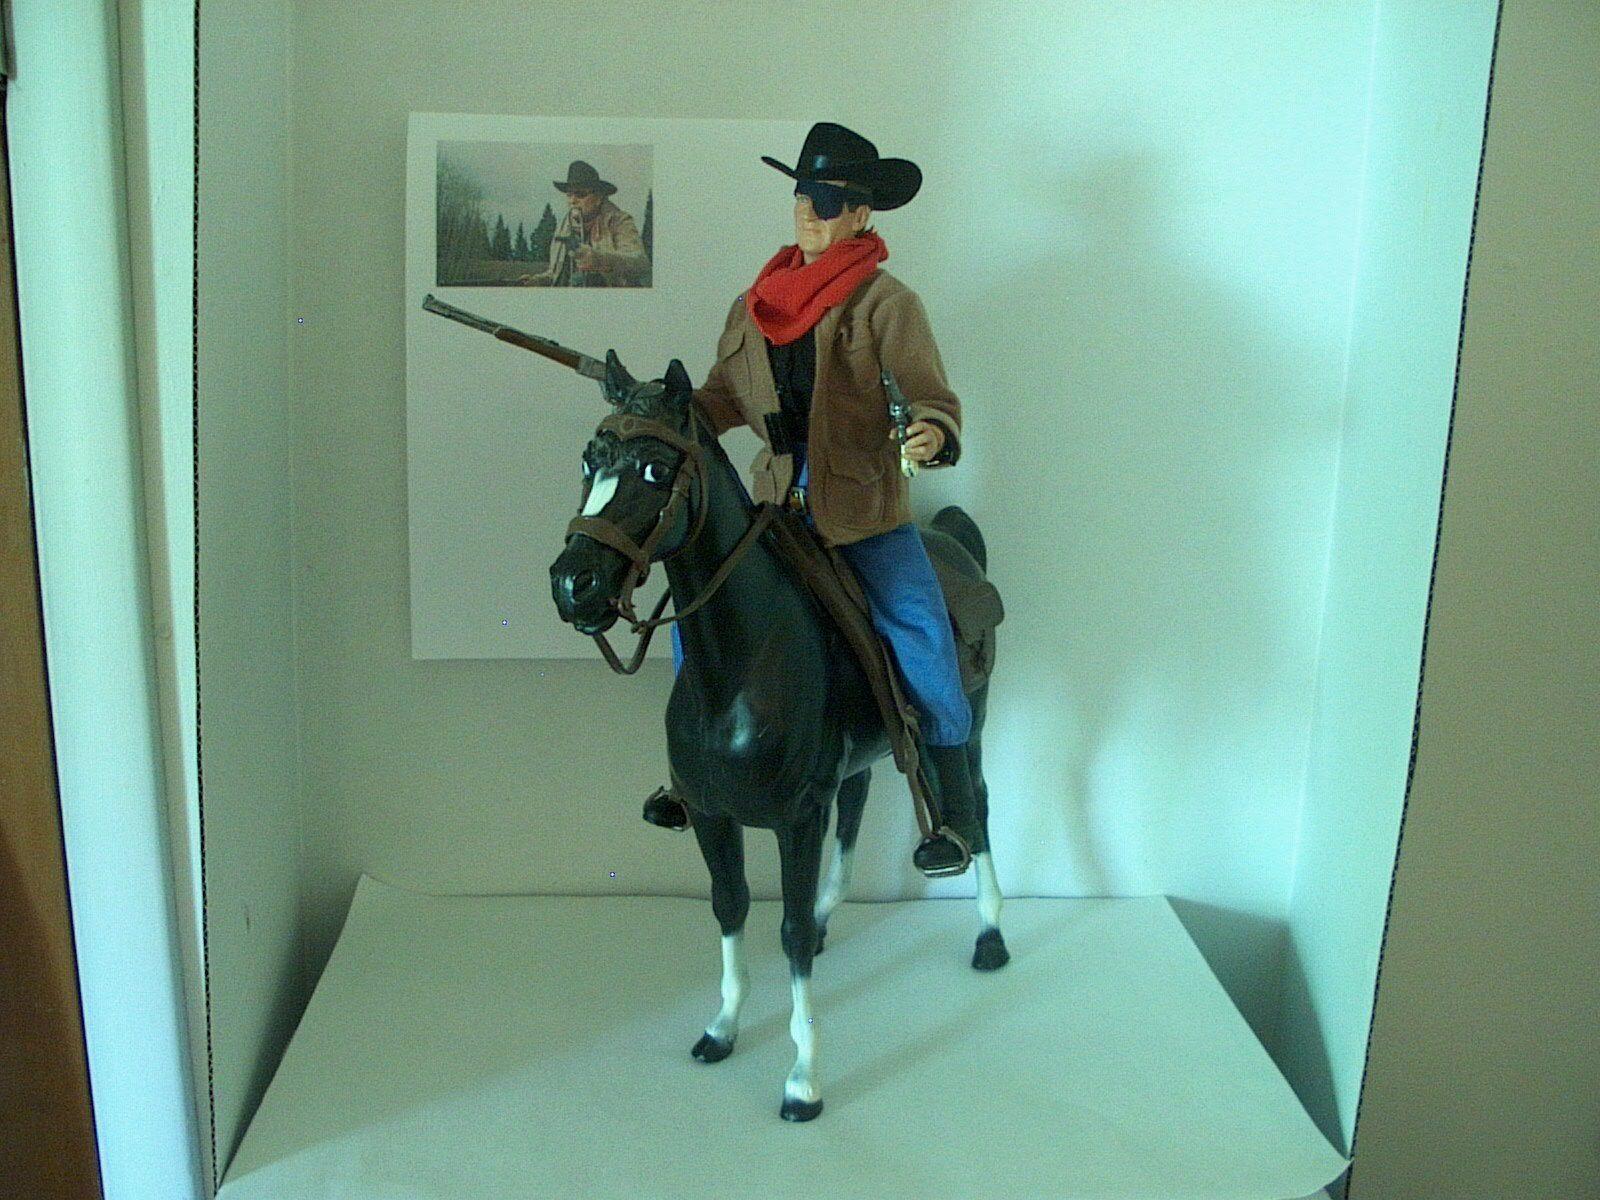 John John John Wayne True Grit Rooster Cogburn movie Old West 12  figure a8057f